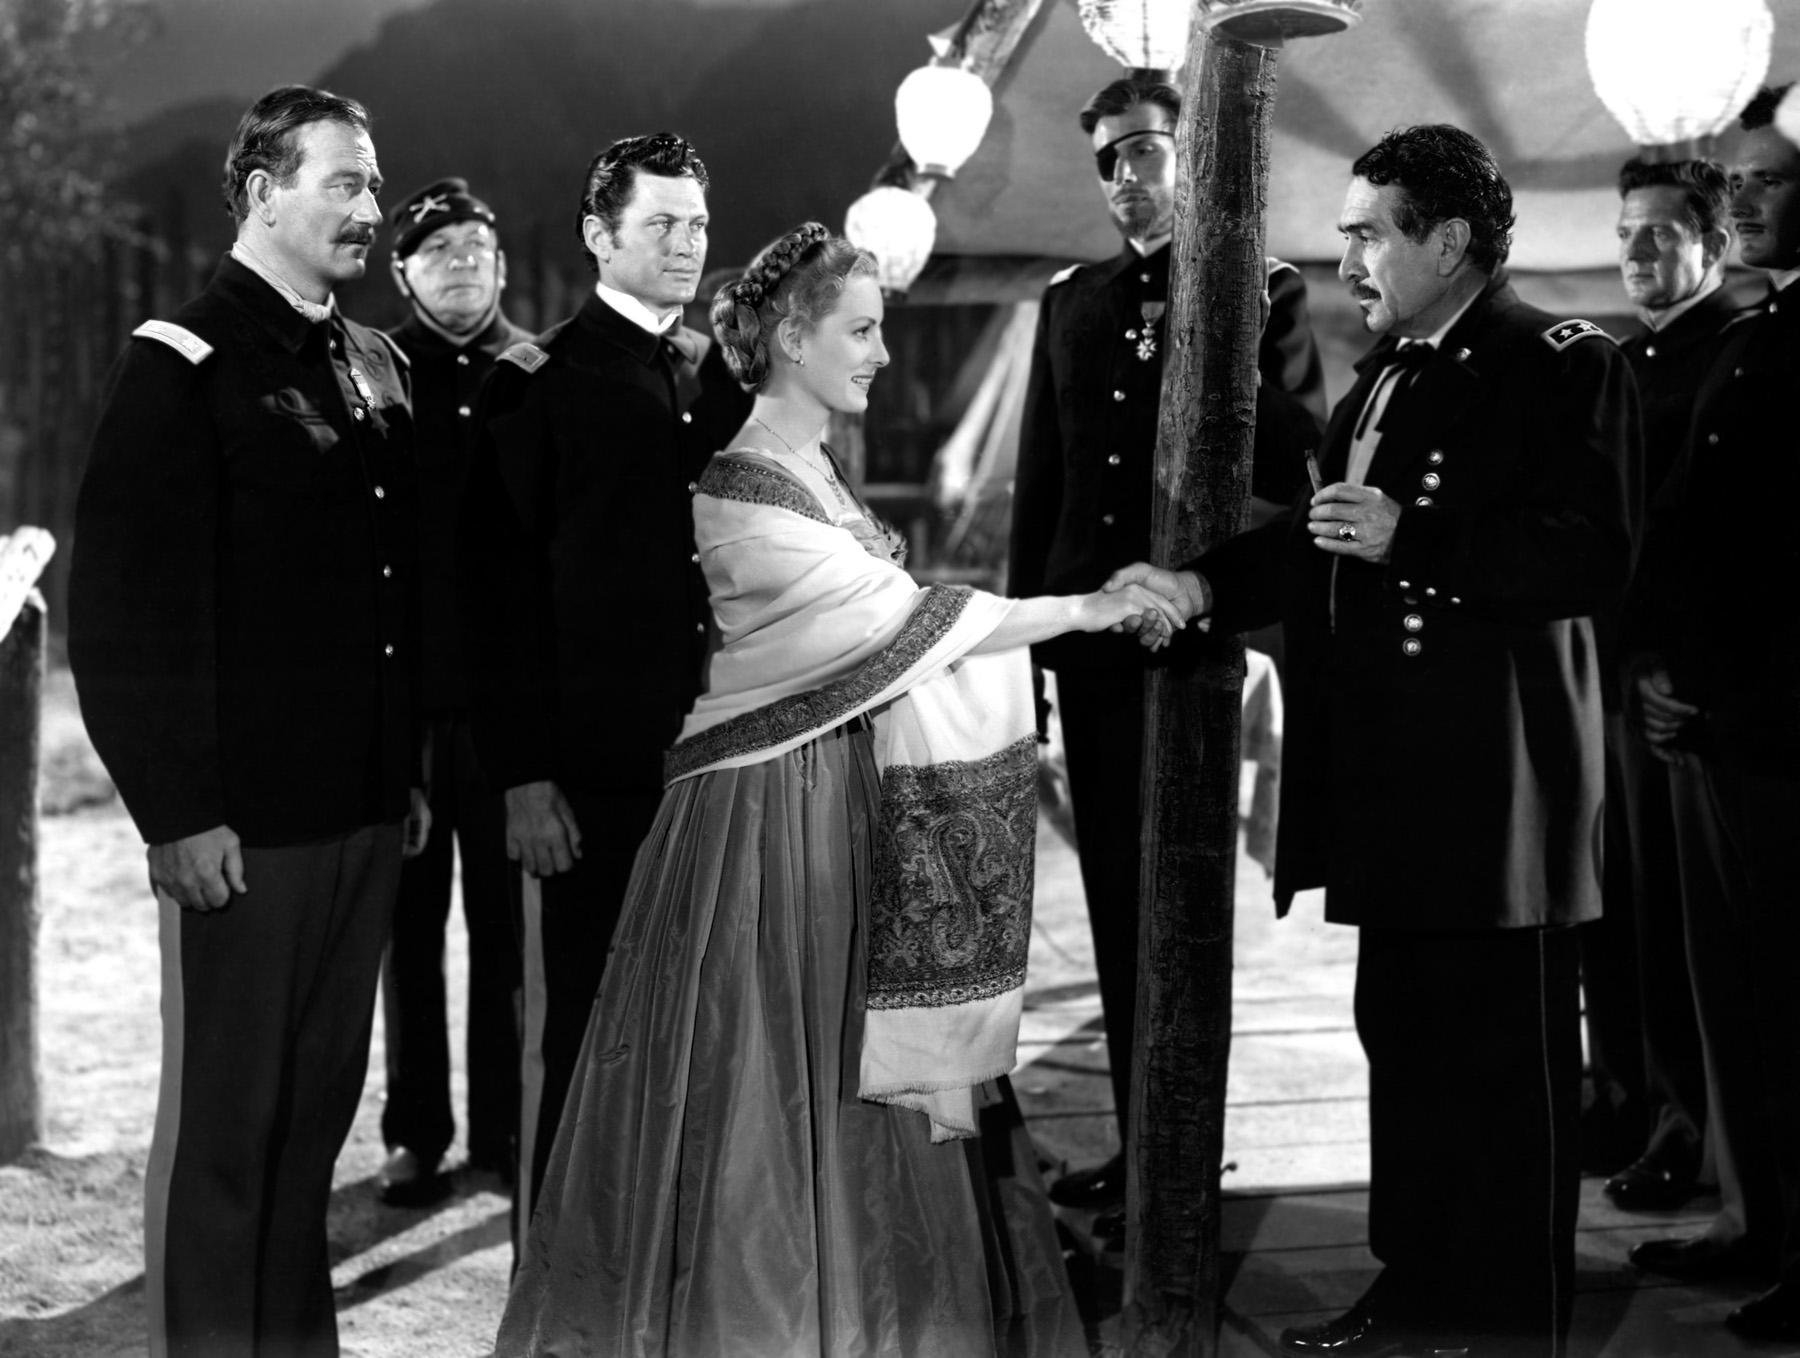 John Wayne with Victor McLaglen,Maureen O'Hara and J. Carrol Naish